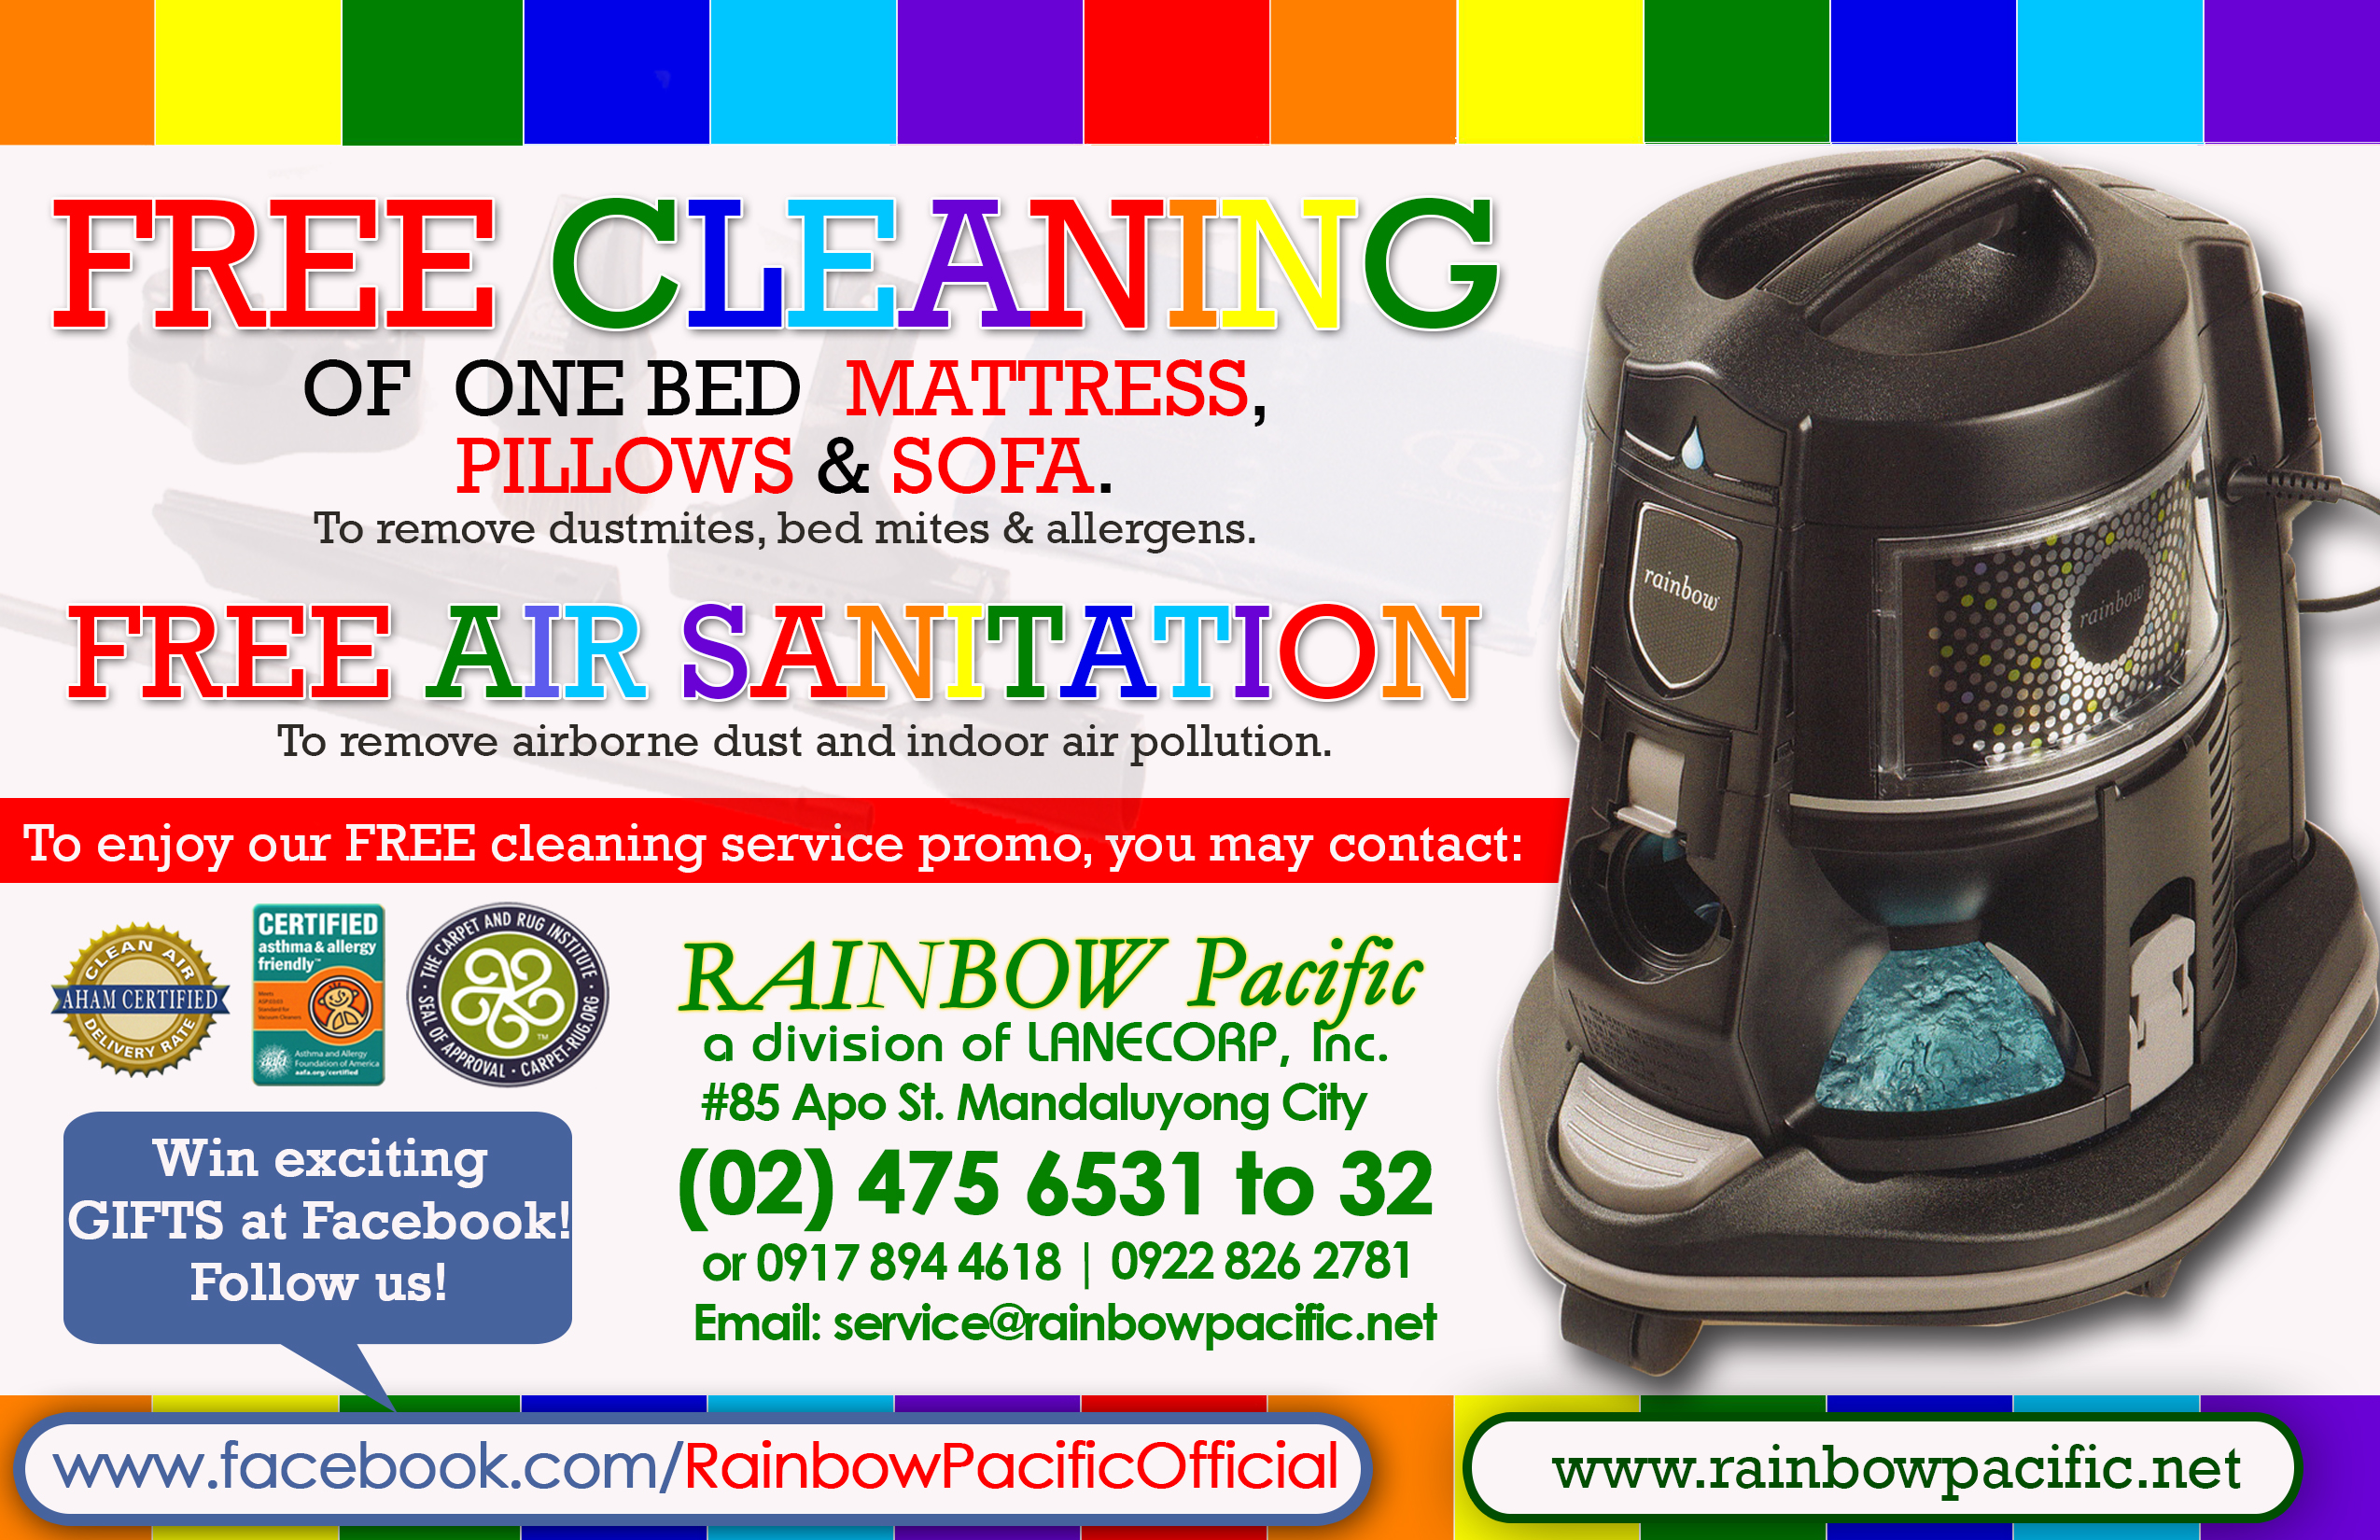 rainbow pacific philippines mandaluyong rainbow aromatizer t